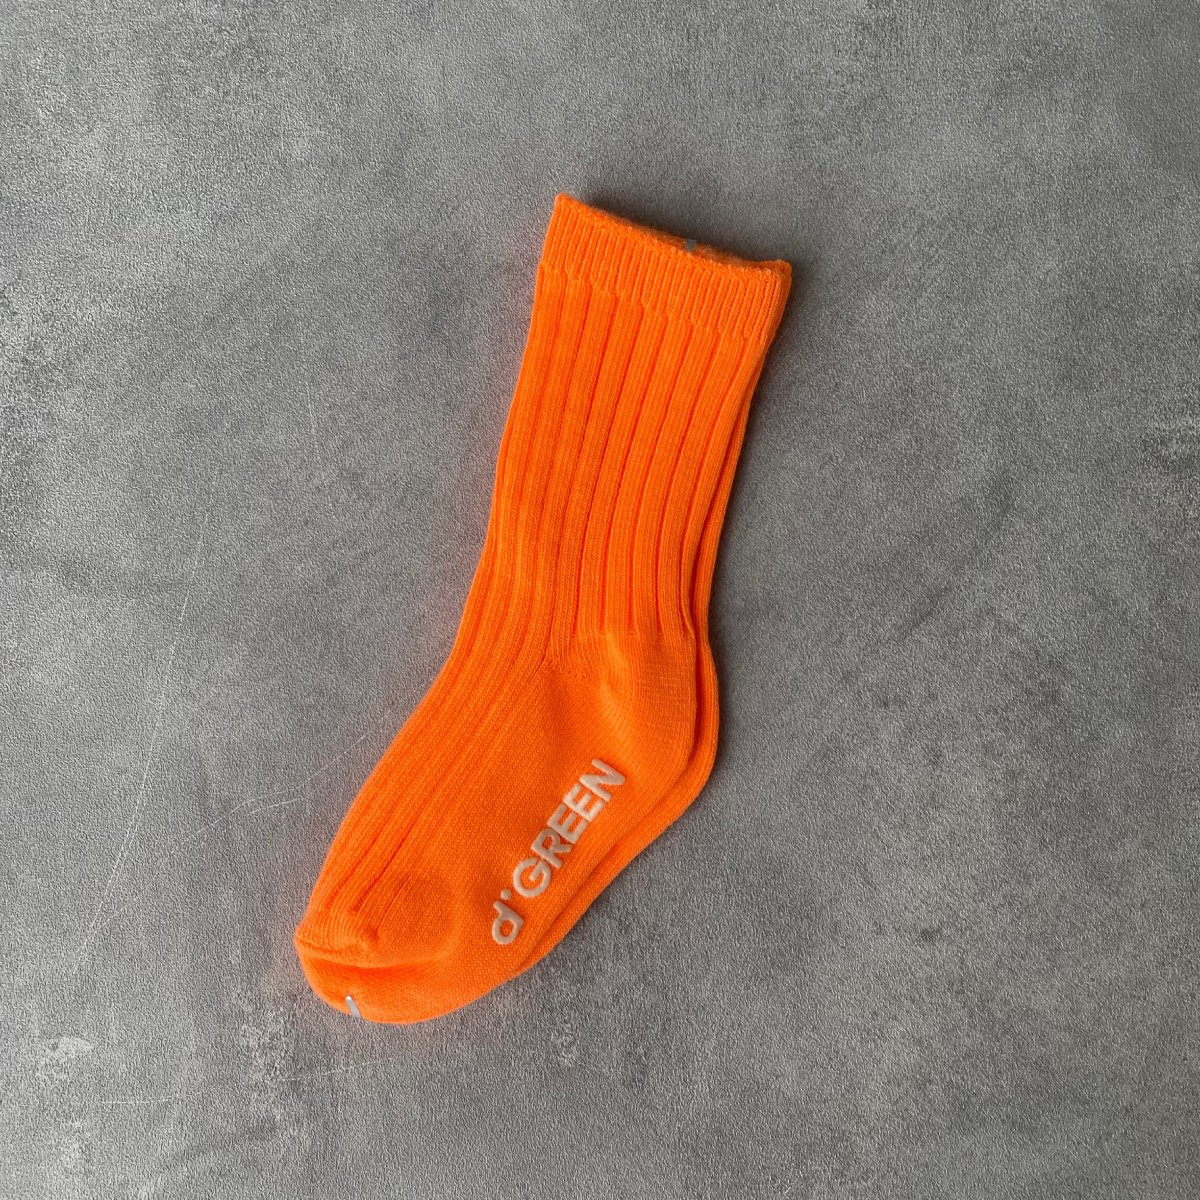 【BABY】Neon Socks 詳細画像14